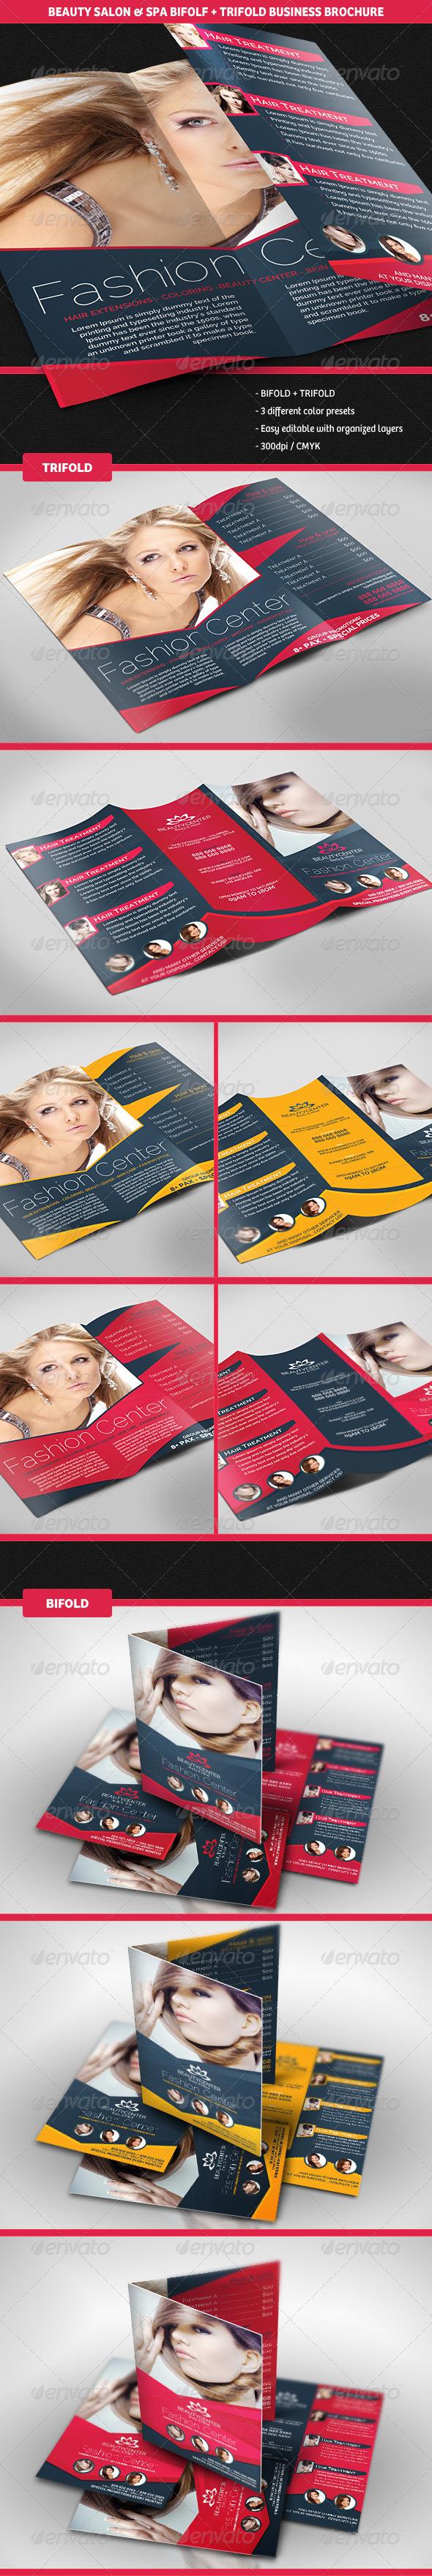 Beauty Center Bifold & Trifold Business Brochures